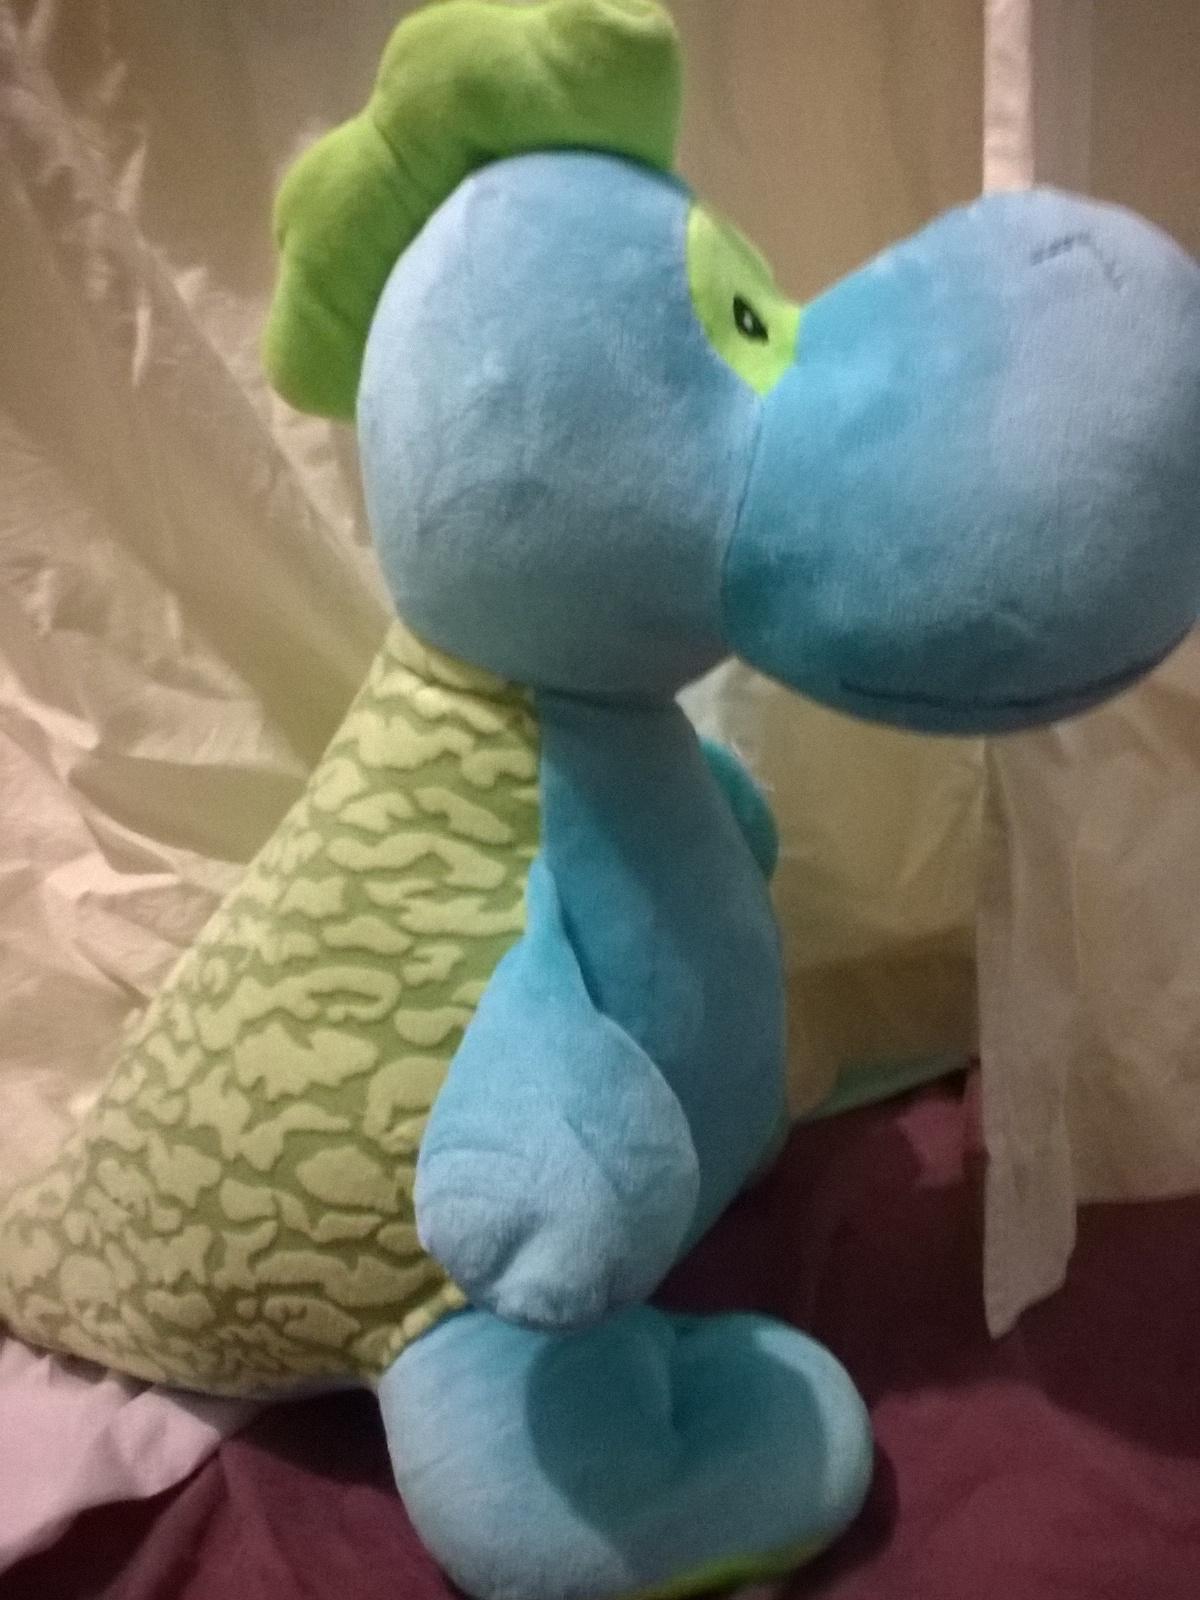 Walmart Carrizal - Villahermosa: Dinosaurio Kidz o time a $35.01